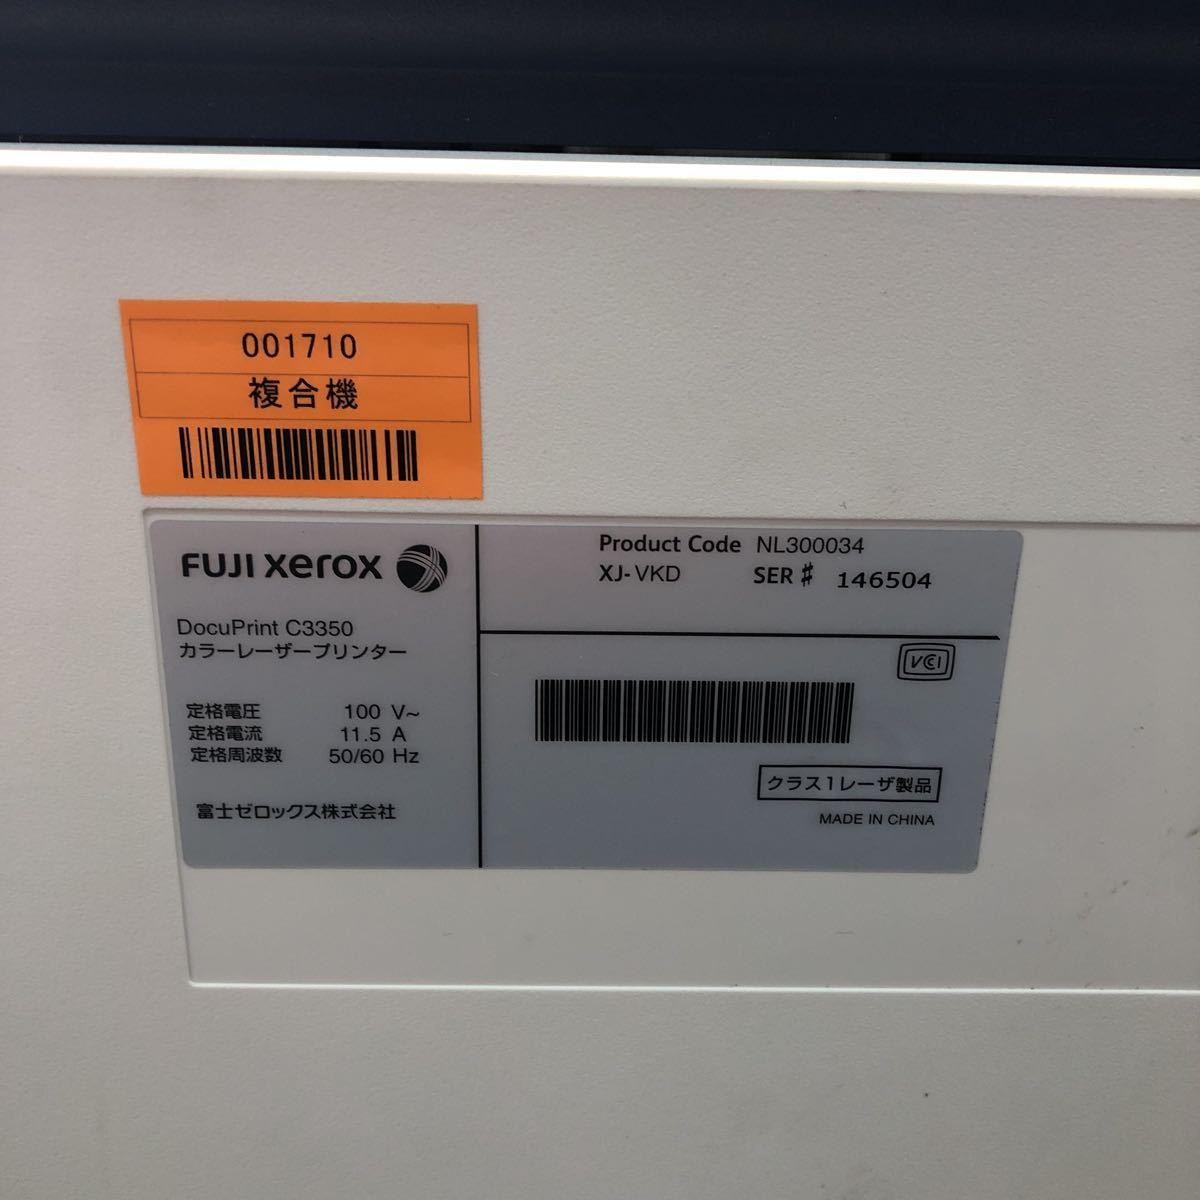 FUJI XEROX 富士ゼロックス A3 カラーレーザー DocuPrint C3350 2段給紙 両面印刷 専用キャスタ台 プリンター コピー機 ファックス_画像6